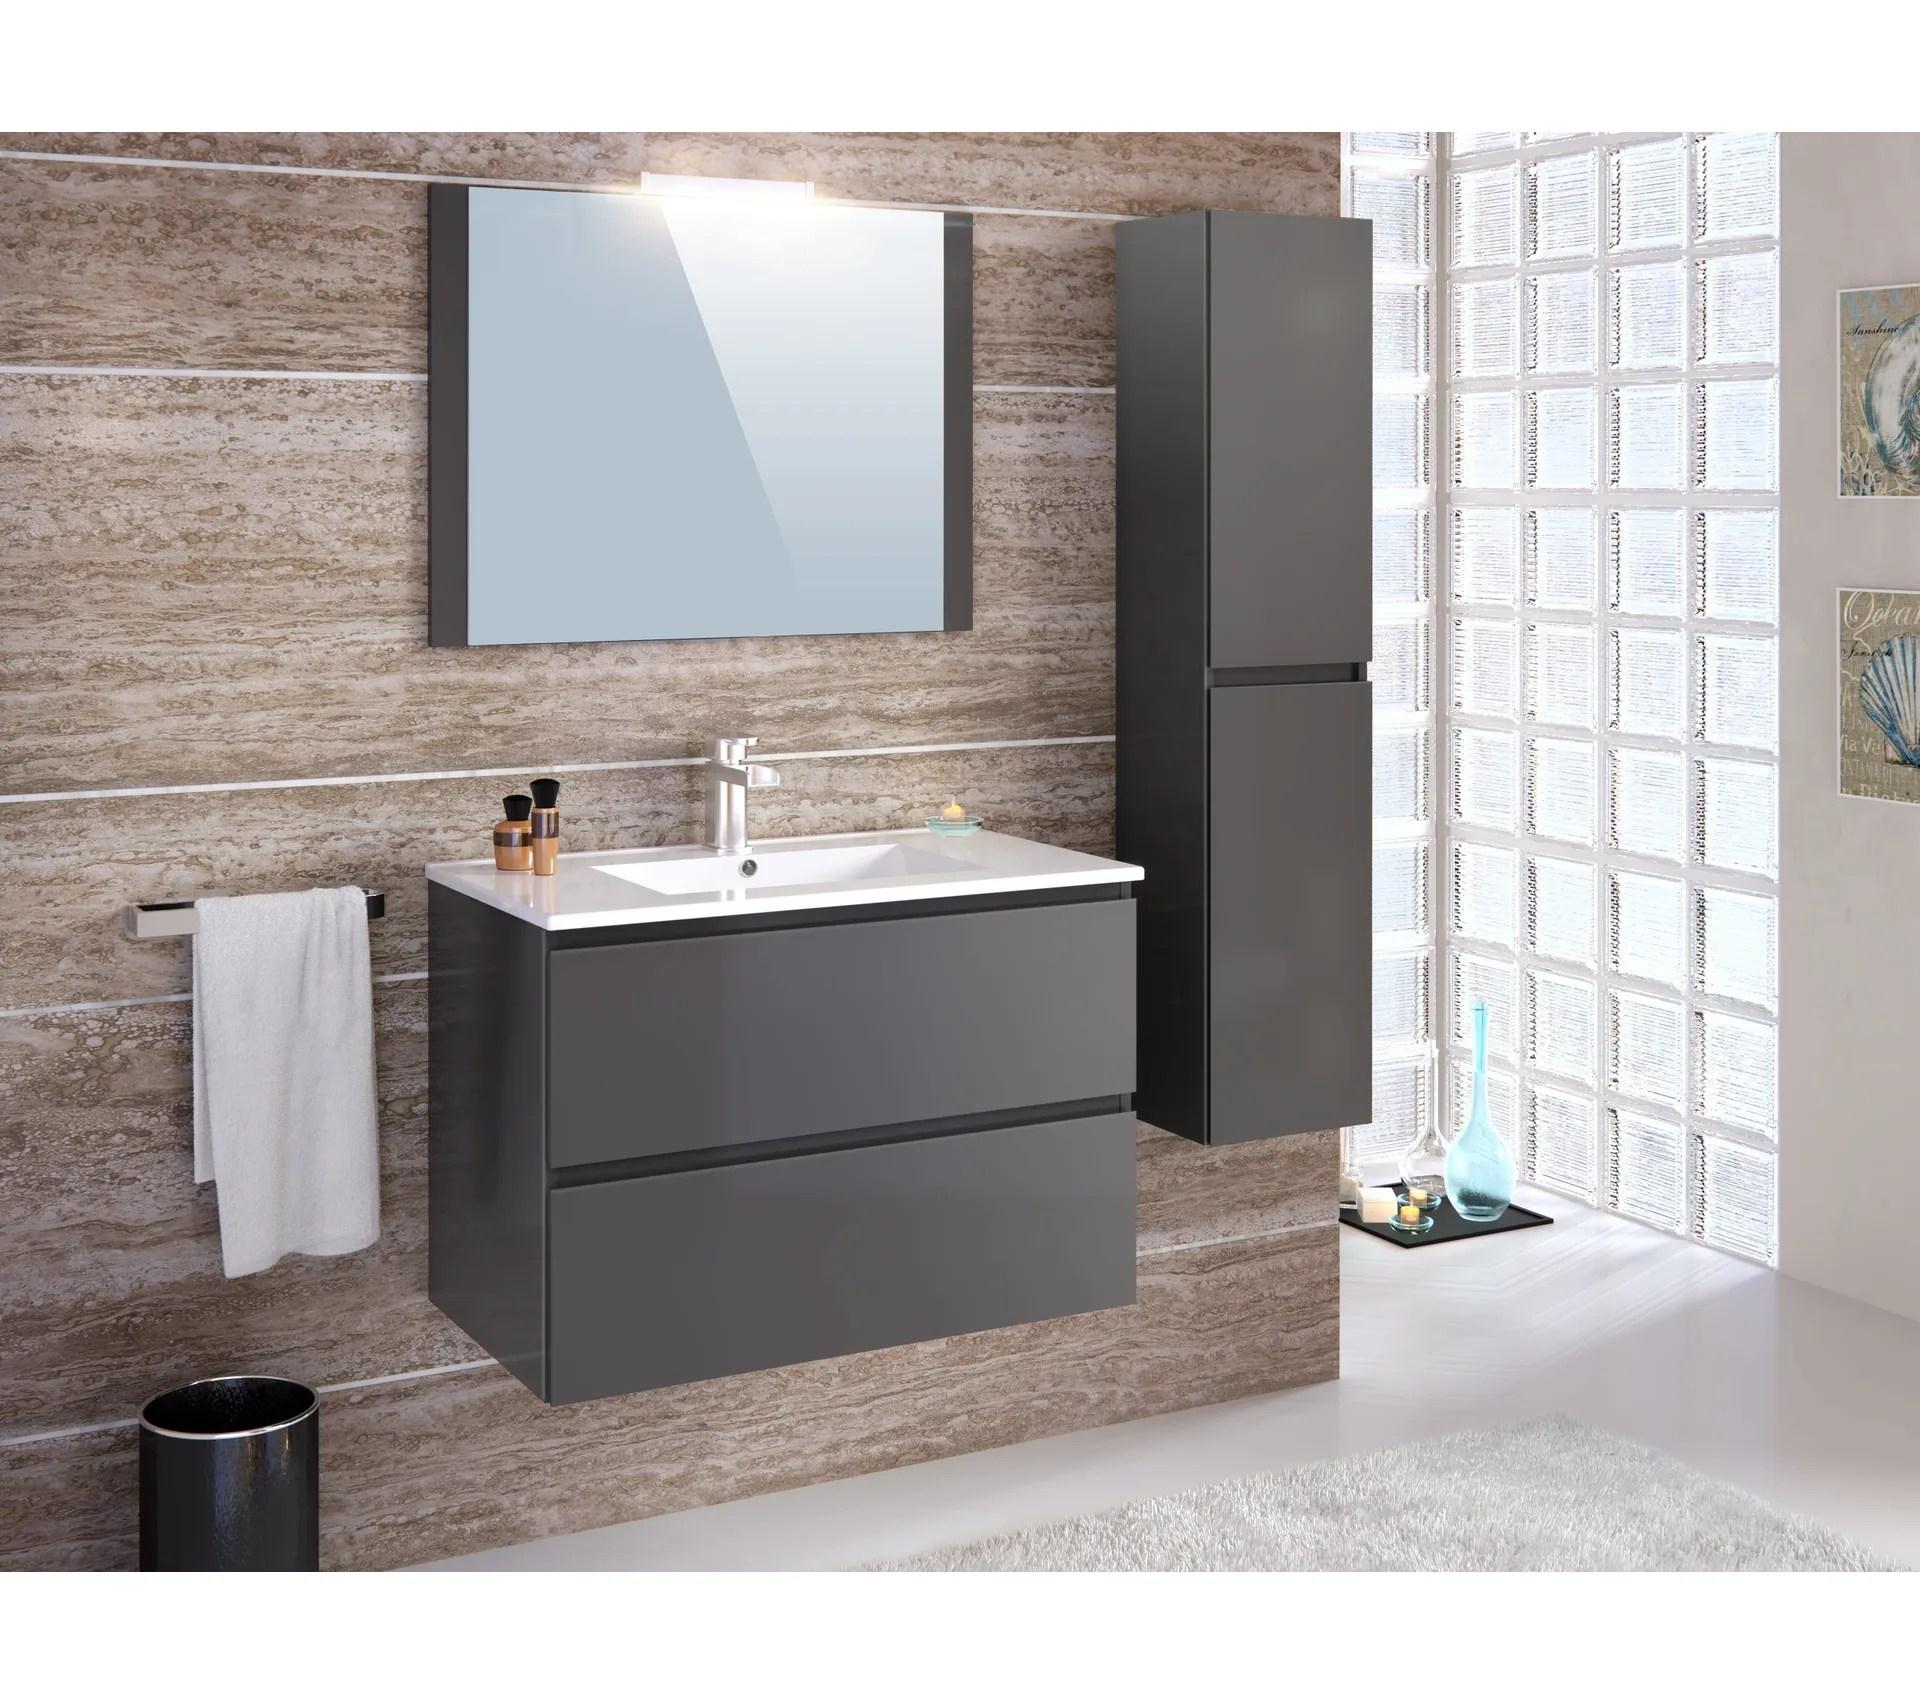 colonne salle de bain a suspendre fidji gris anthracite